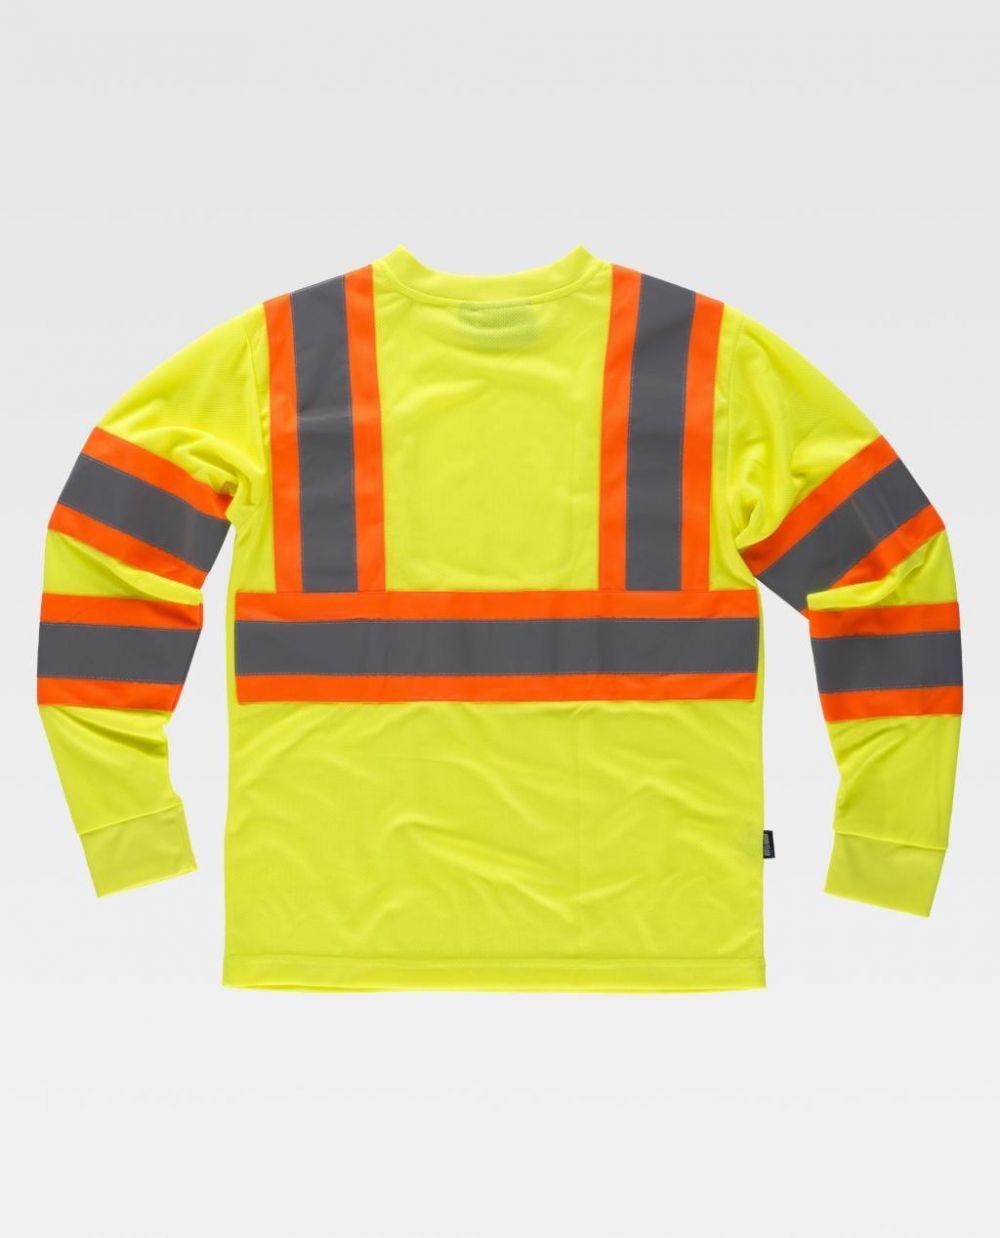 Camisetas reflectantes workteam reflectante fluorescente ml de poliéster vista 1